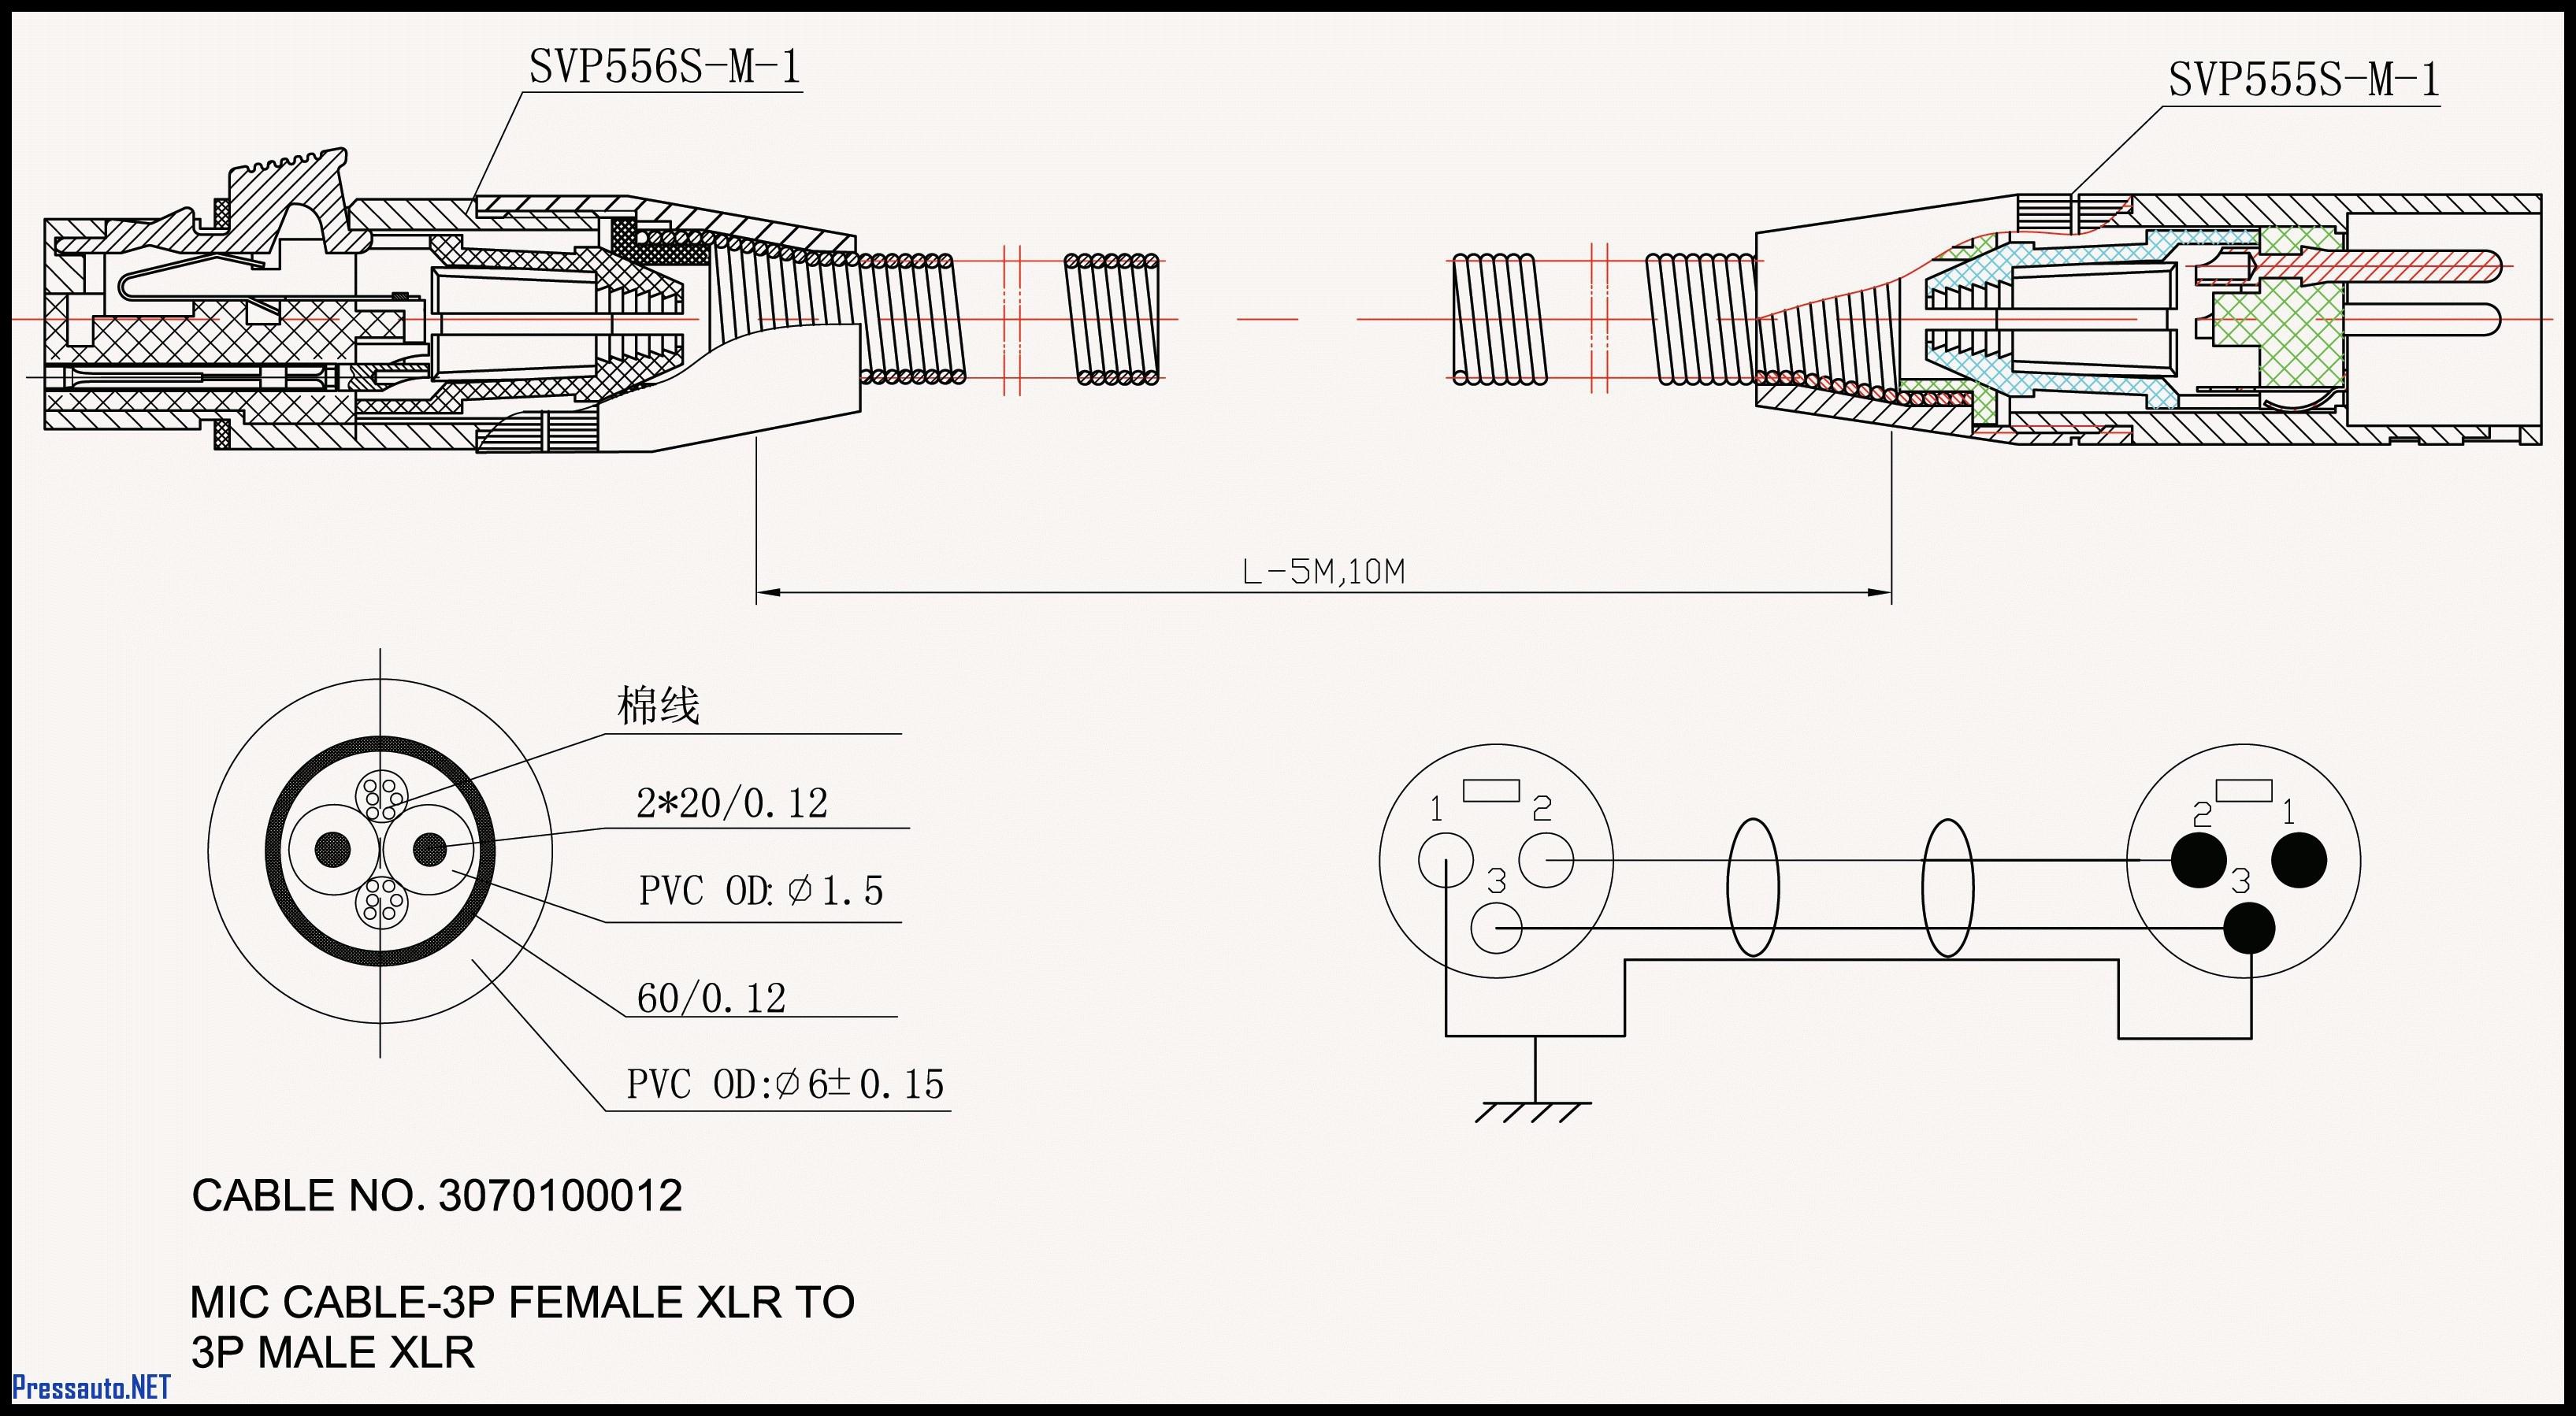 Toyota Corolla Alternator Wiring Diagram Simple Wiring Diagram Toyota Corolla 1997 – Ipphil